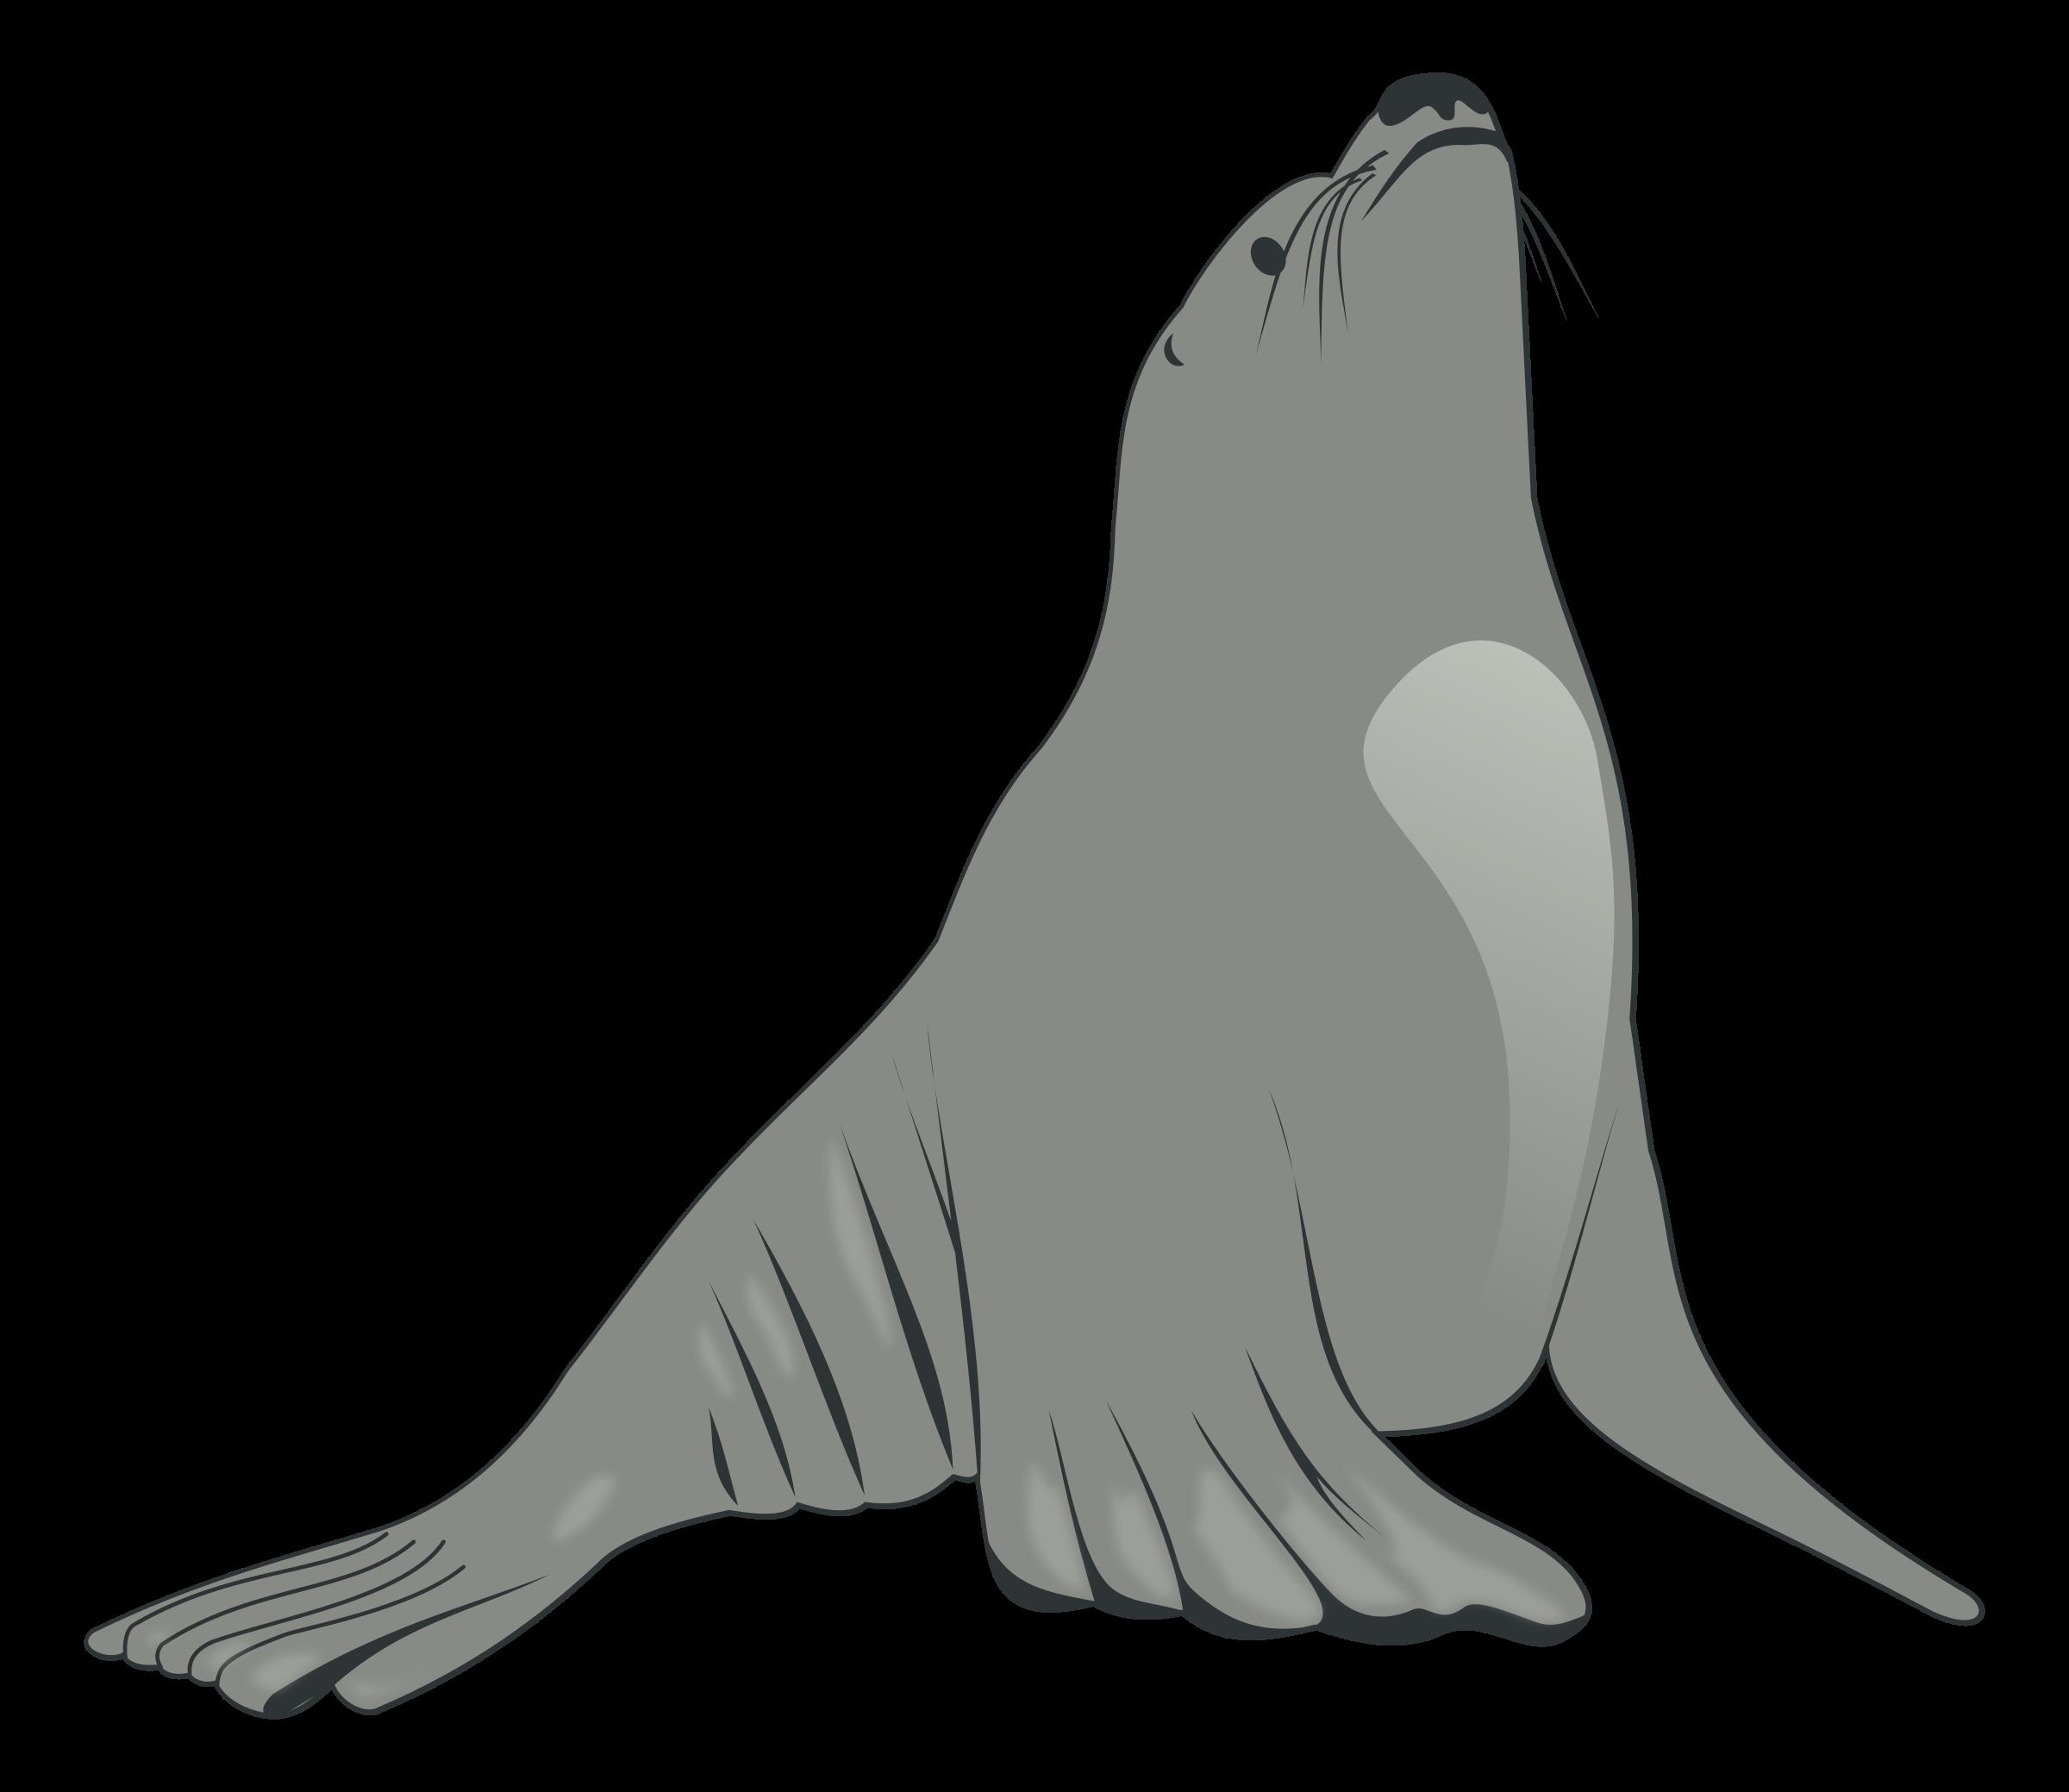 Walrus clipart black and white. Sea lion